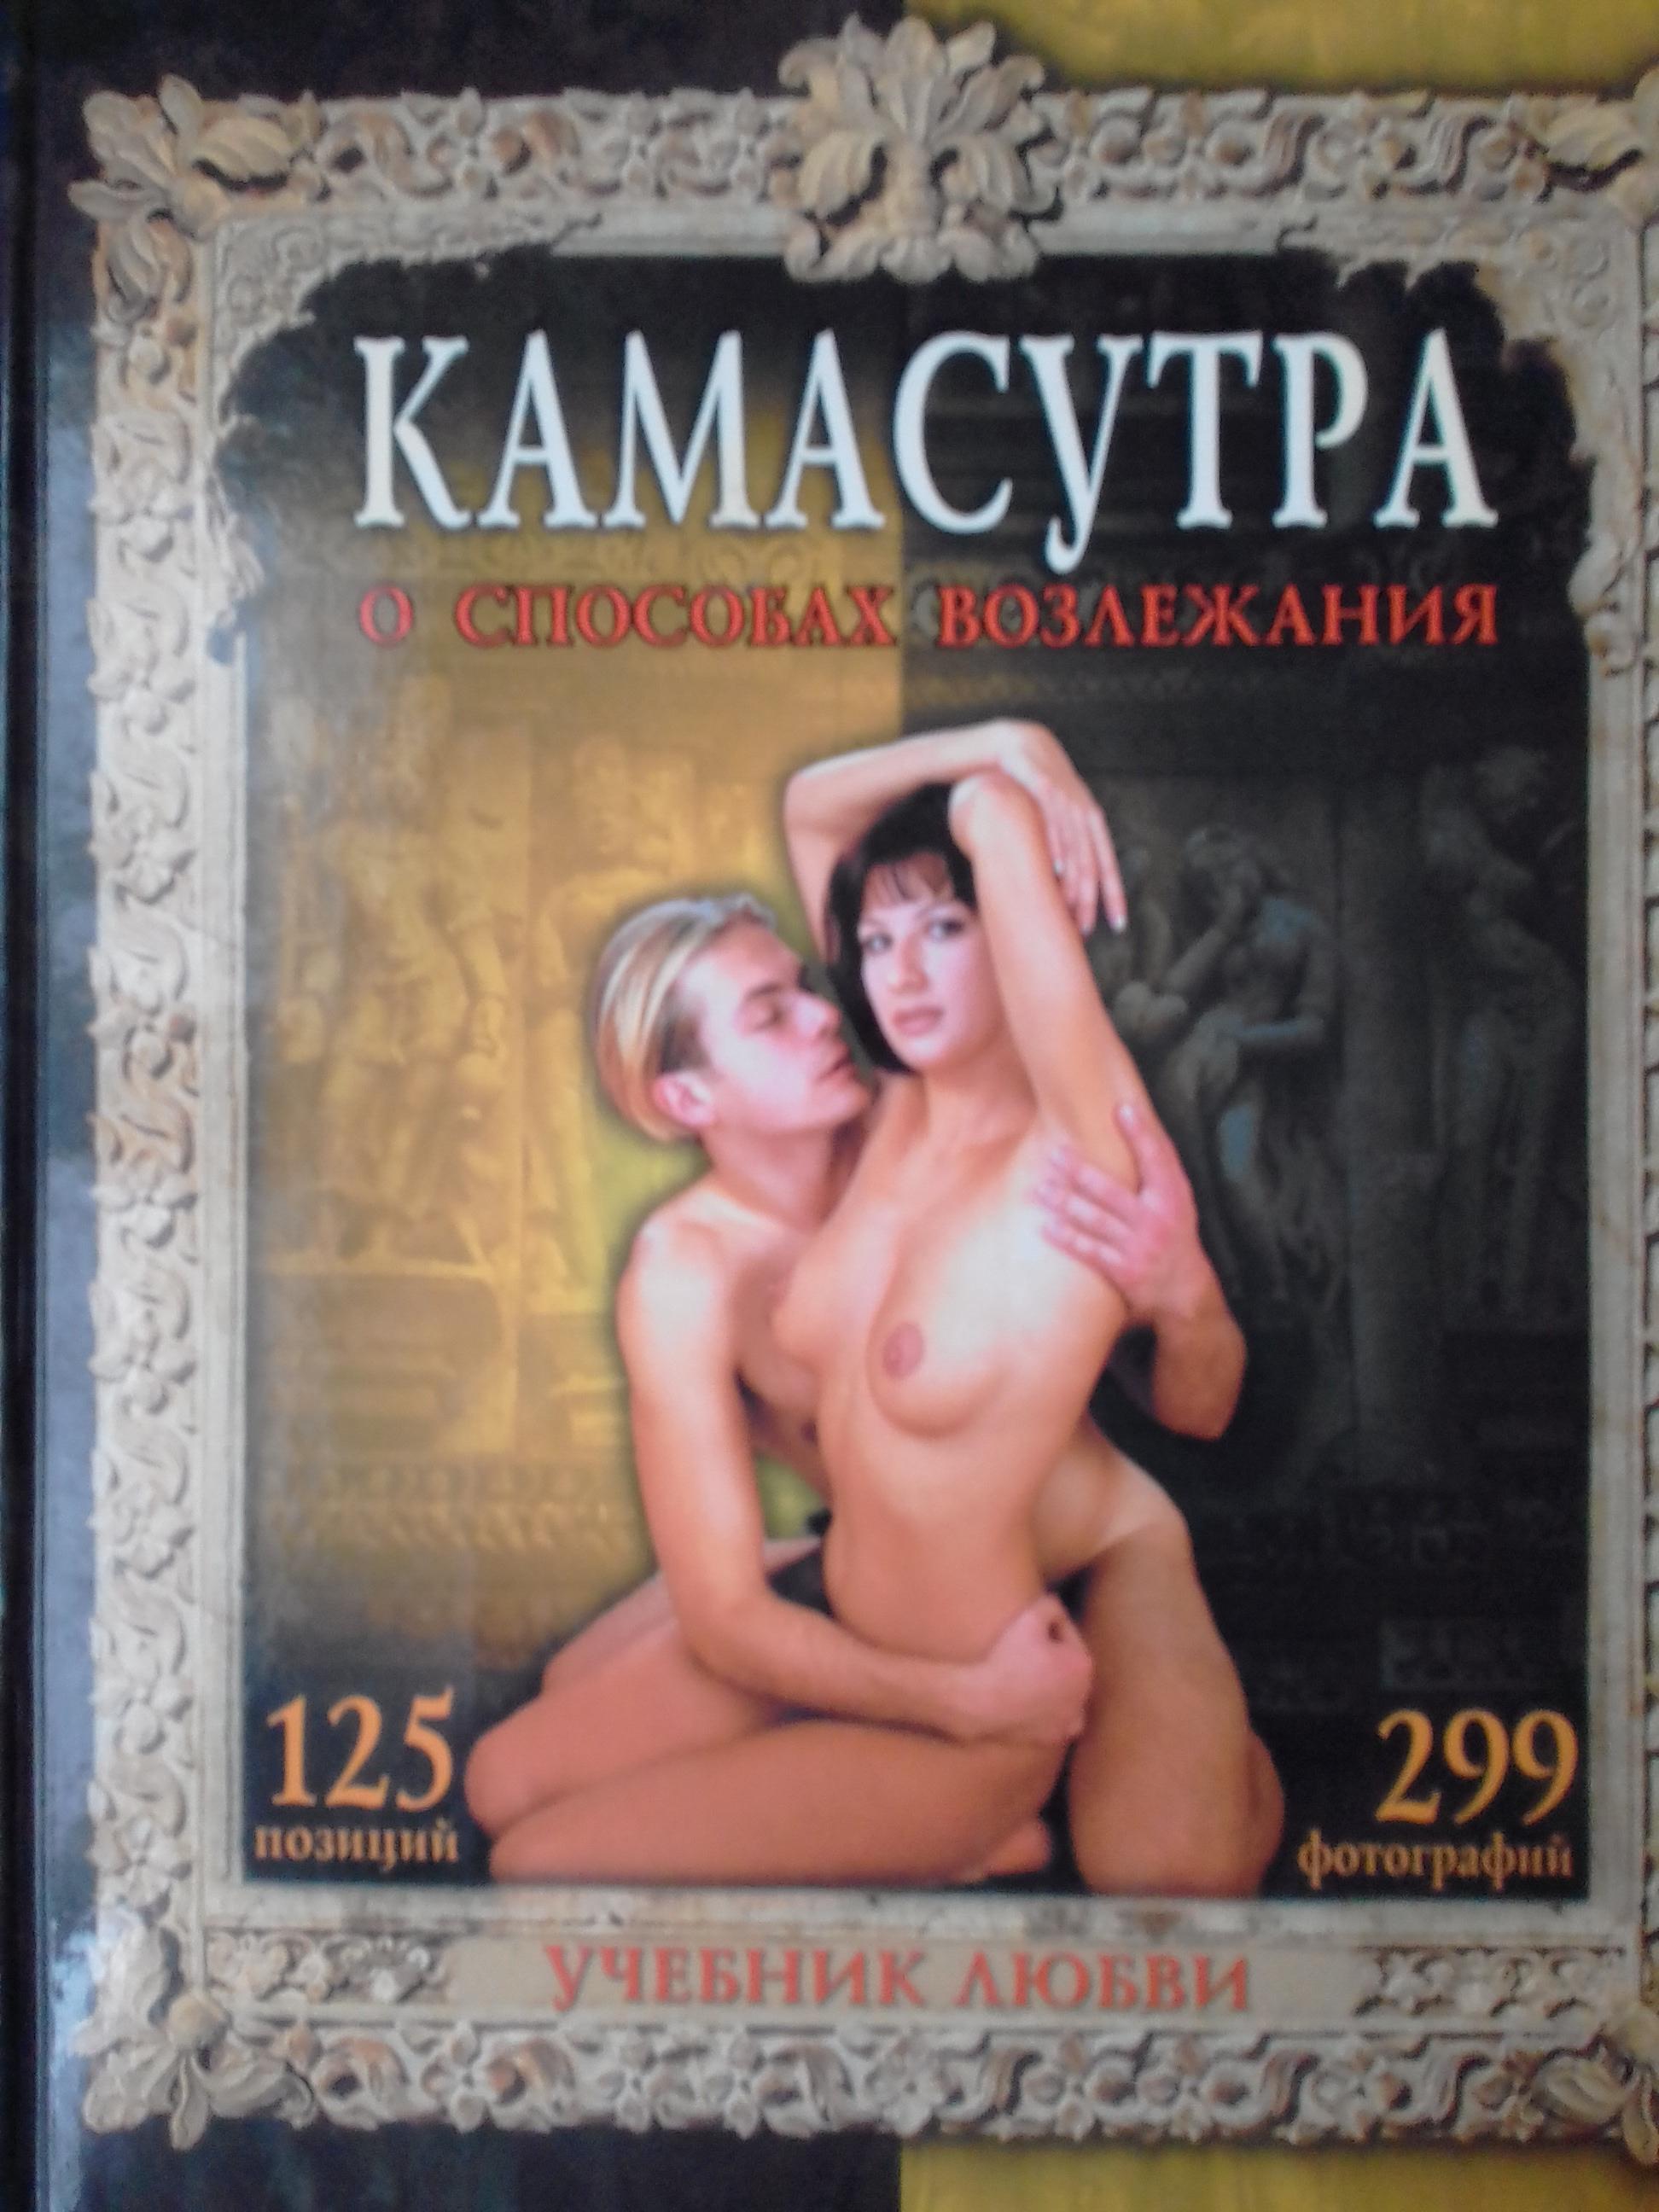 Камасутра-учебник любви